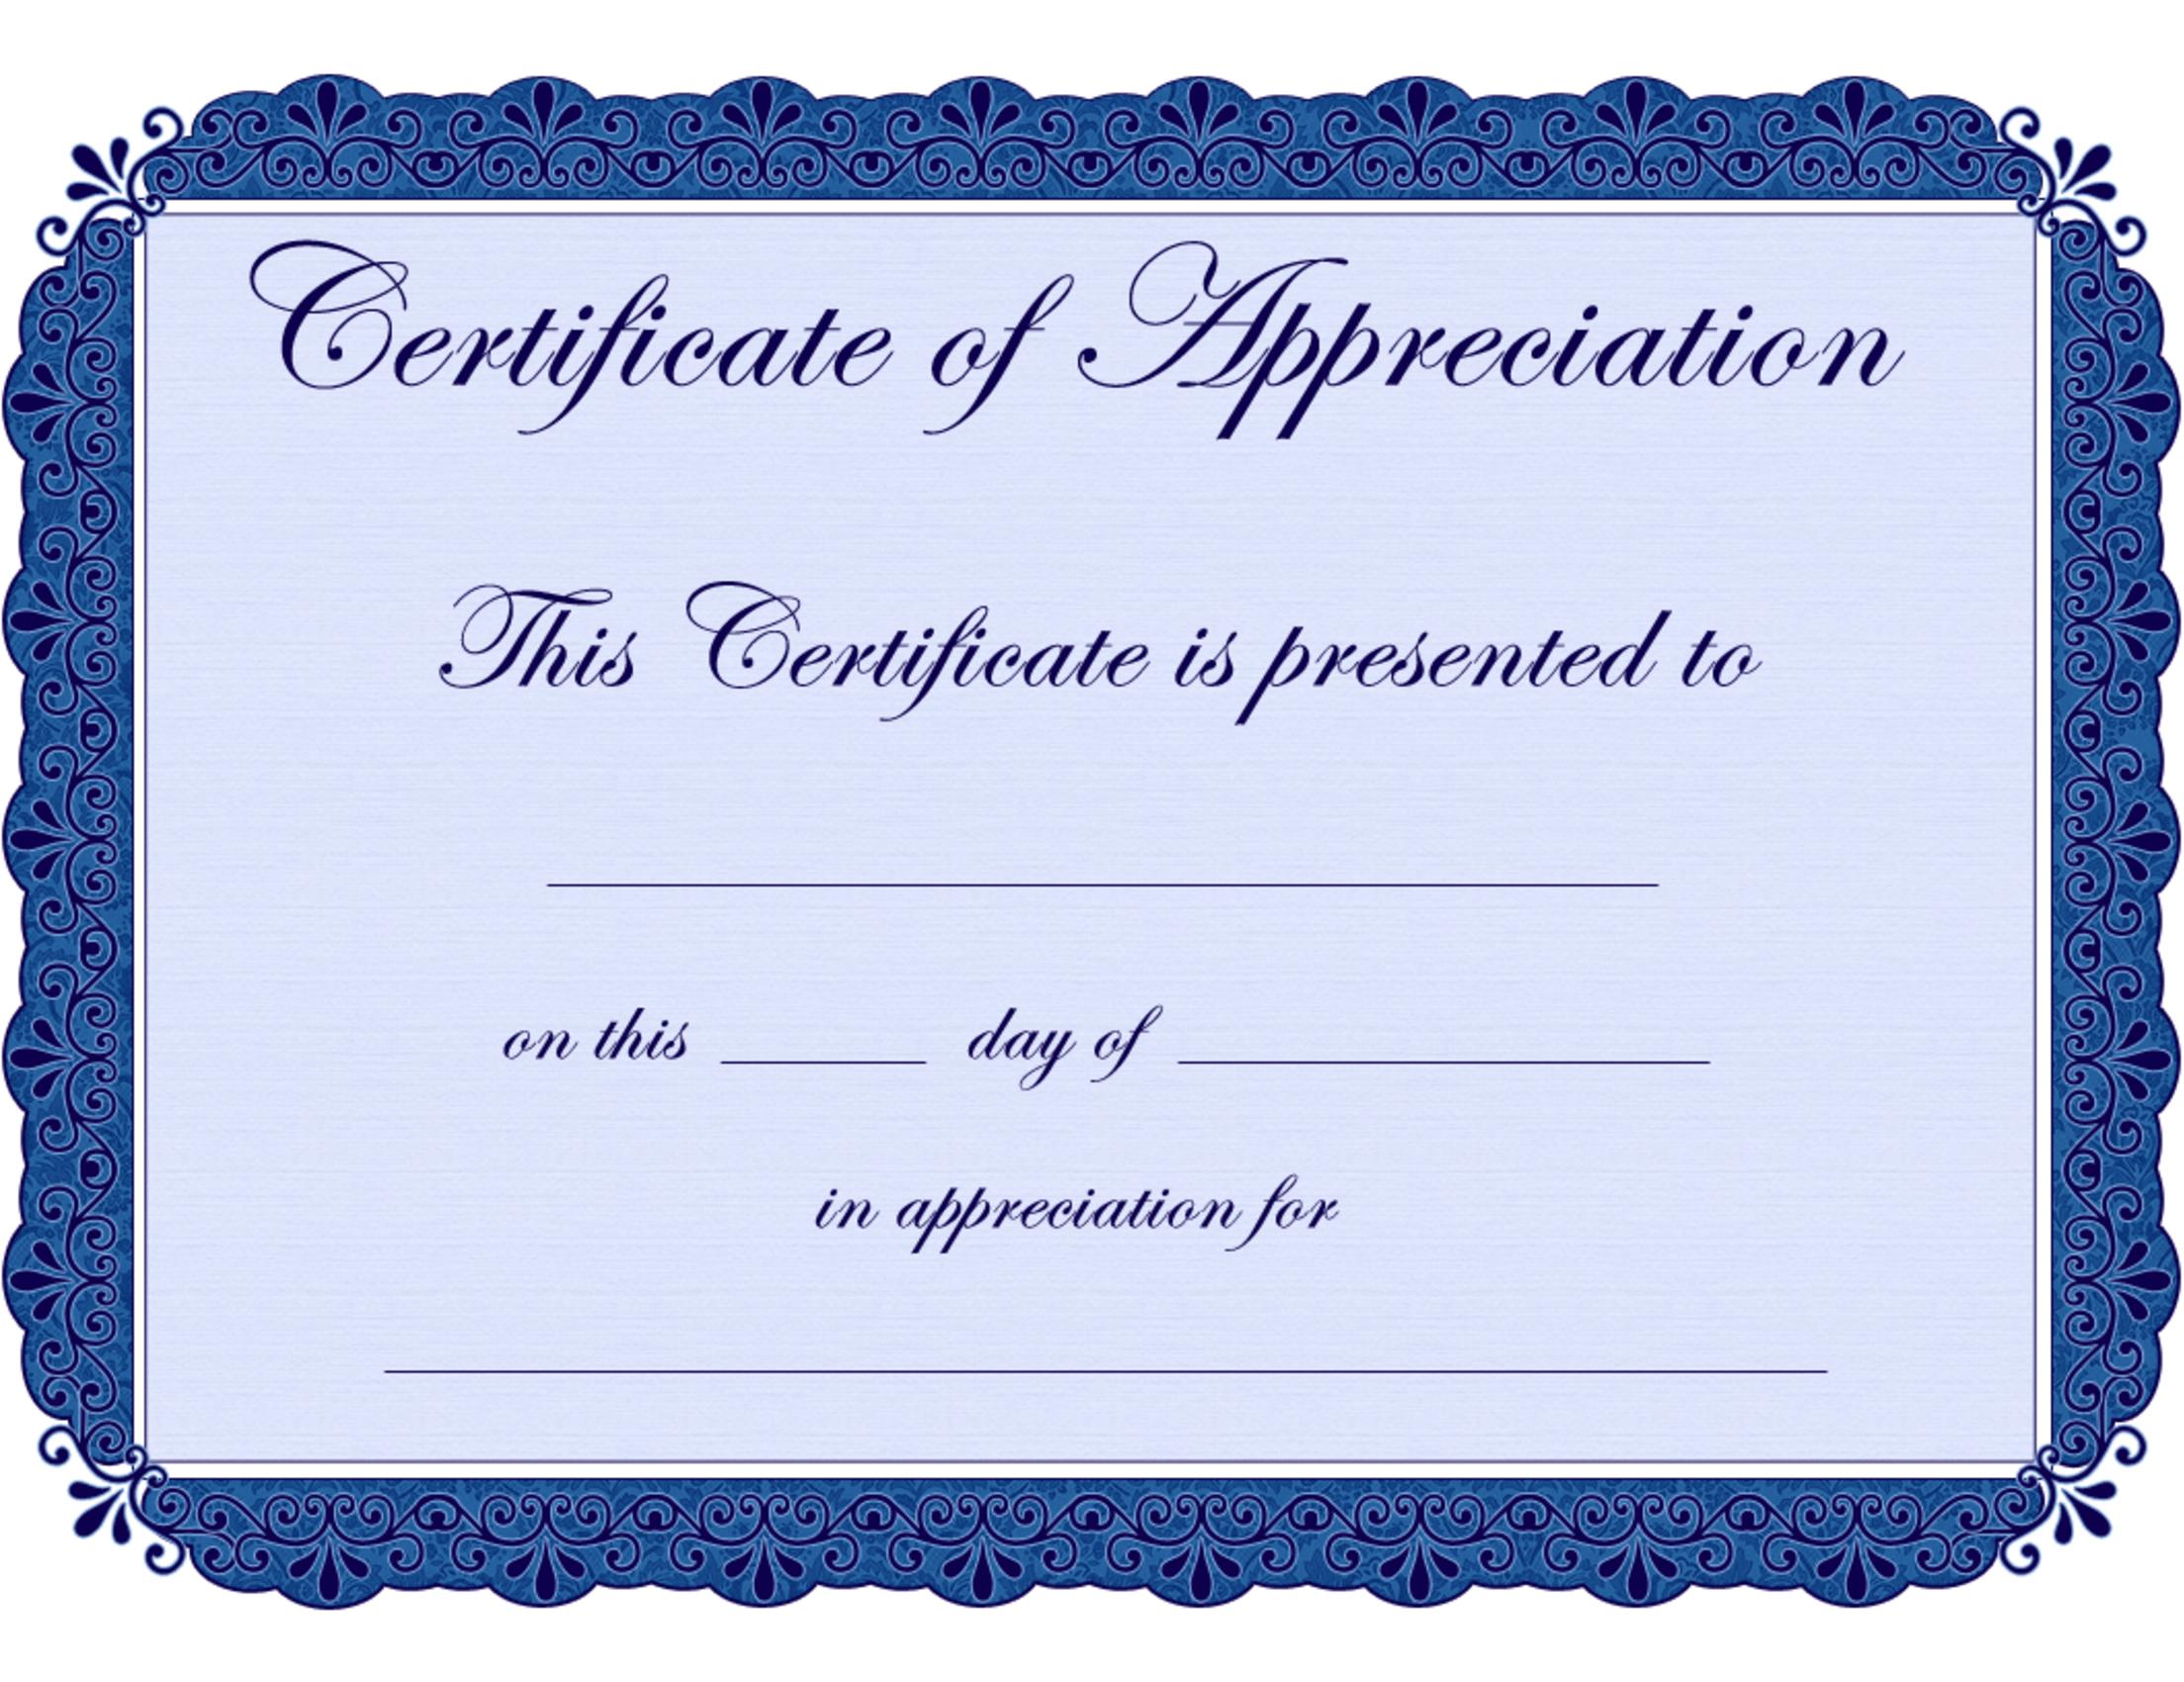 Free Printable Certificates Certificate Of Appreciation Certificate - Free Printable Certificates